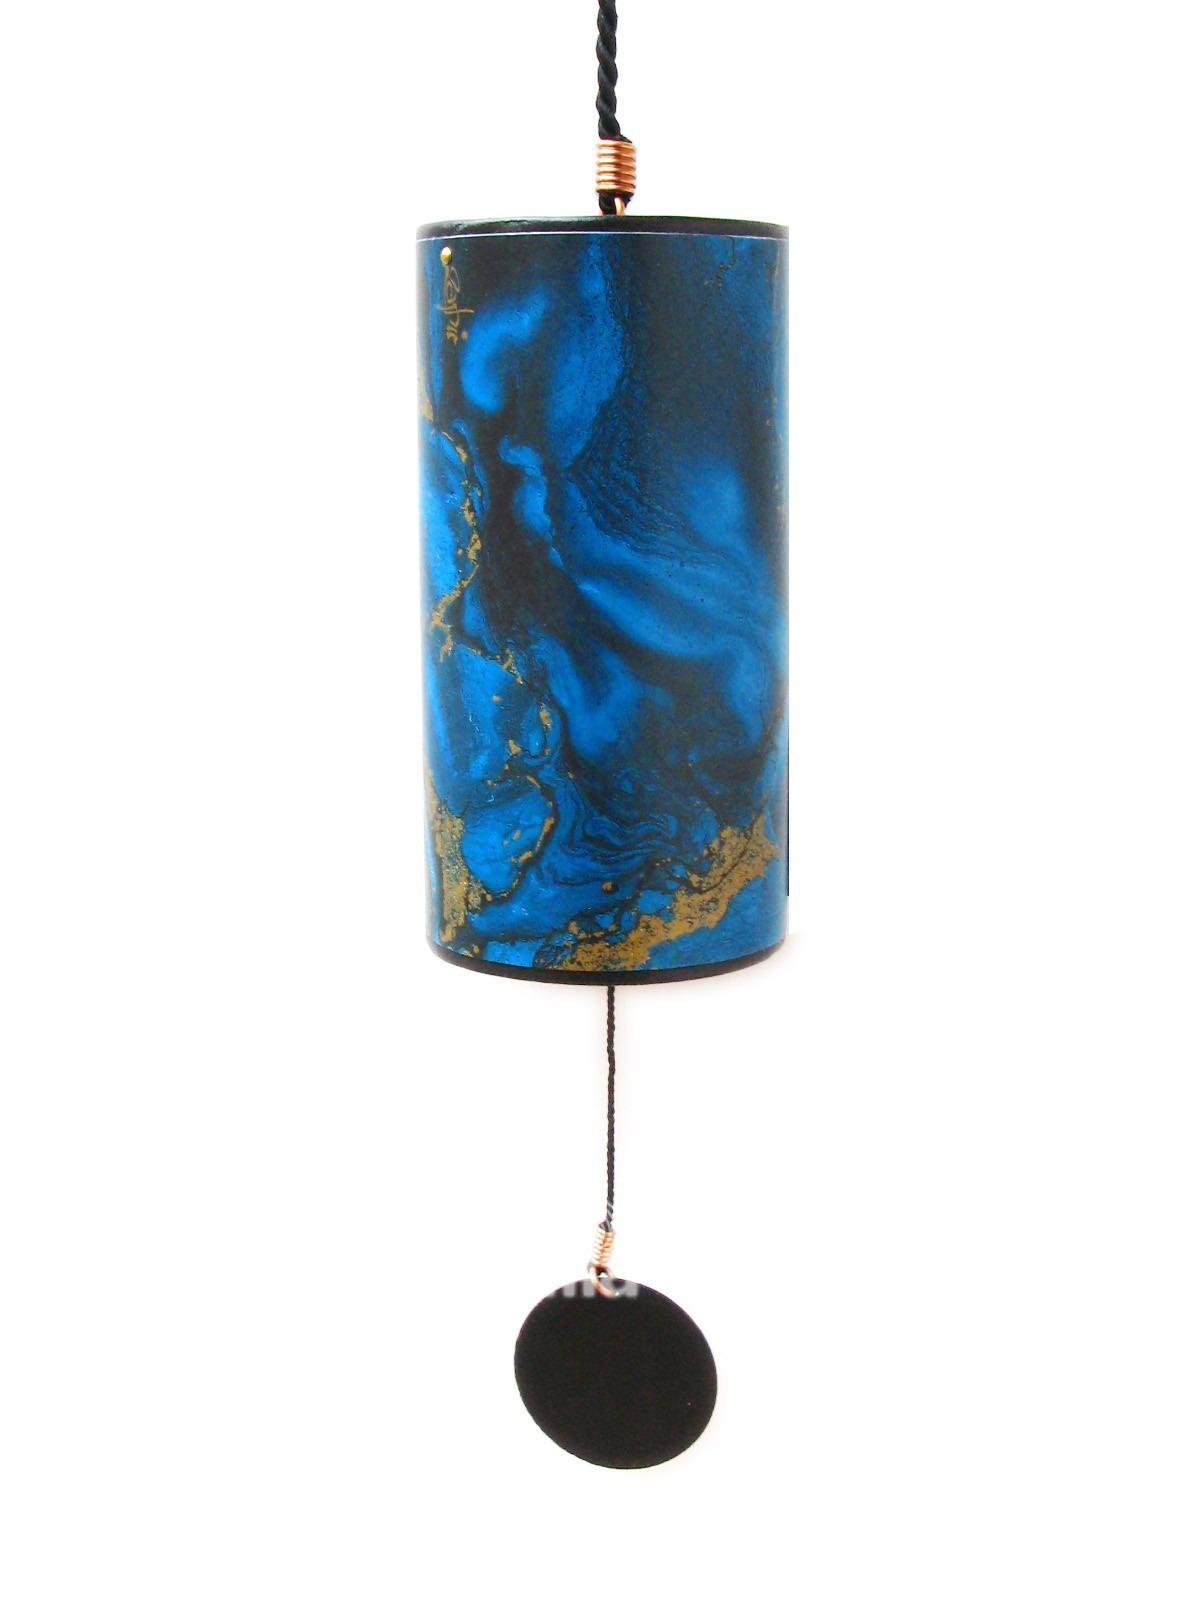 Zaphir couleur Bleu